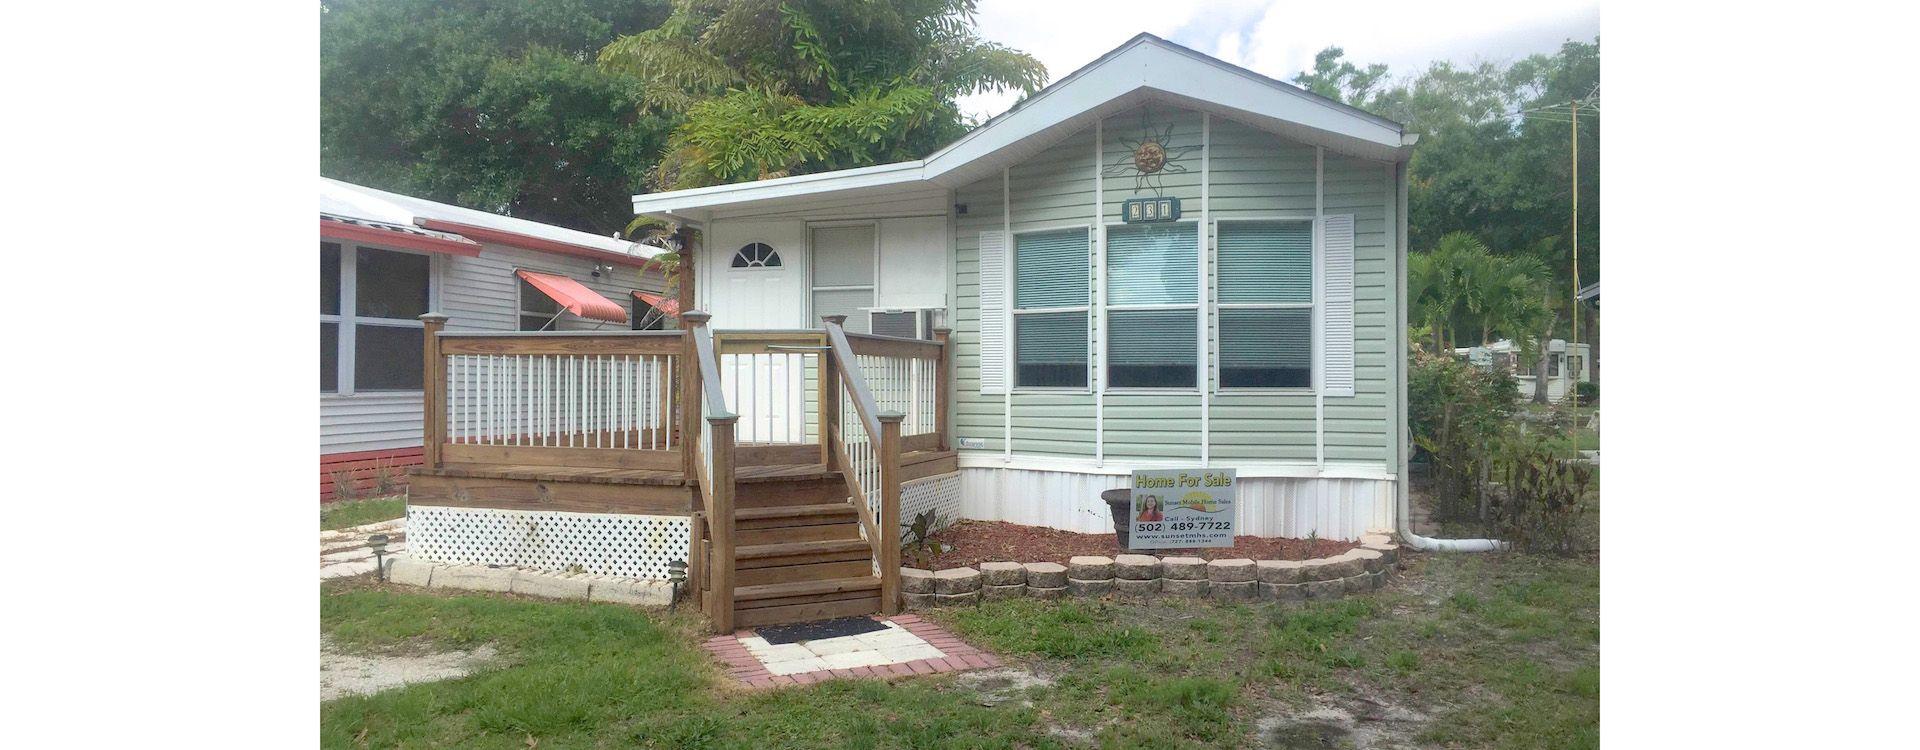 Mobile Home For Sale Largo, FL Vacation Village 231